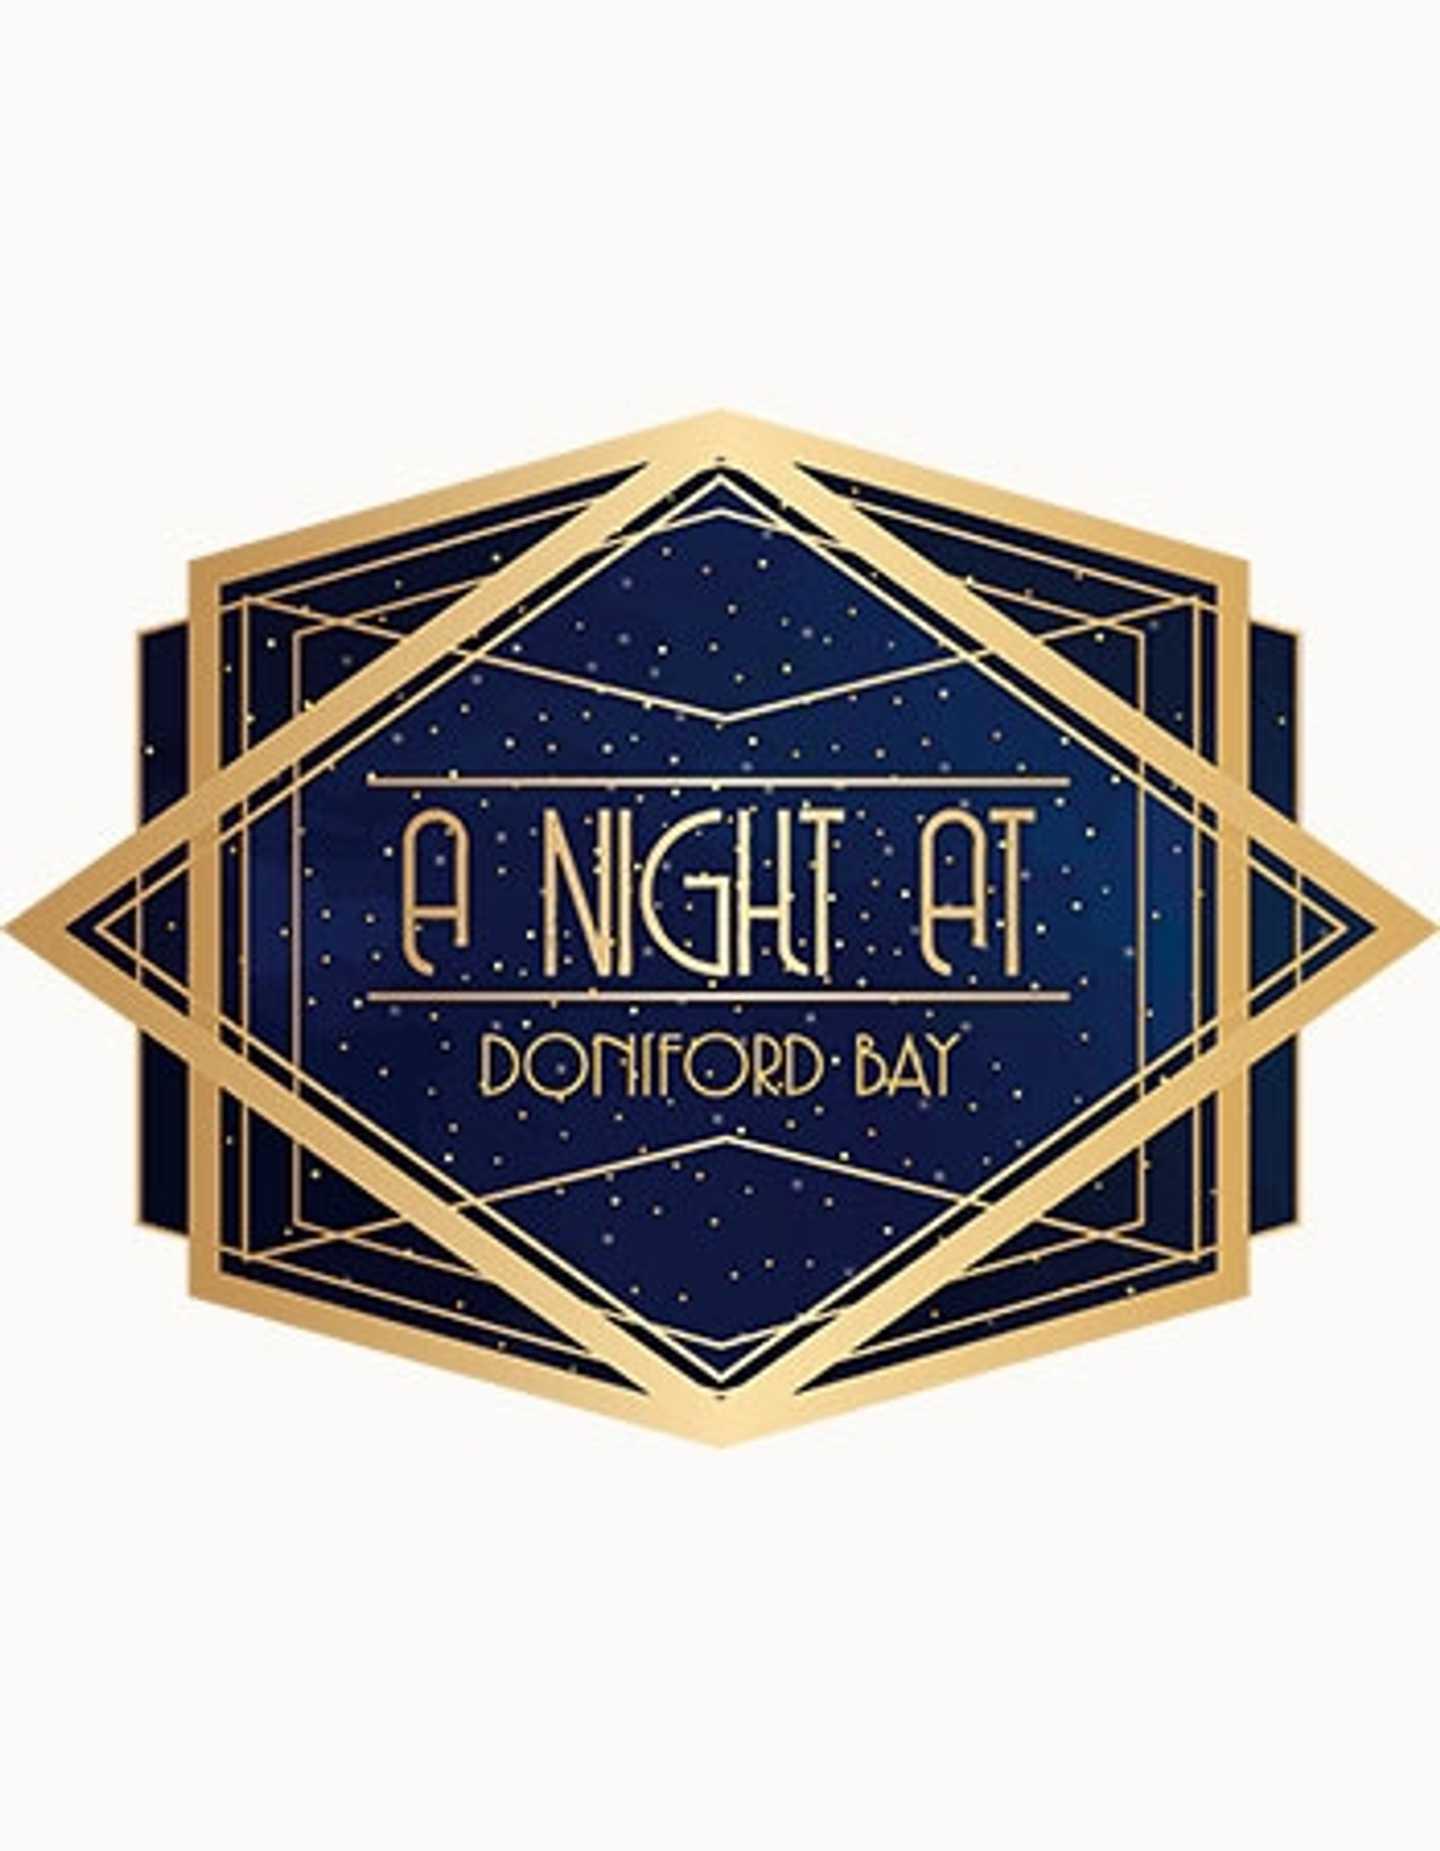 A night @ Doniford Bay